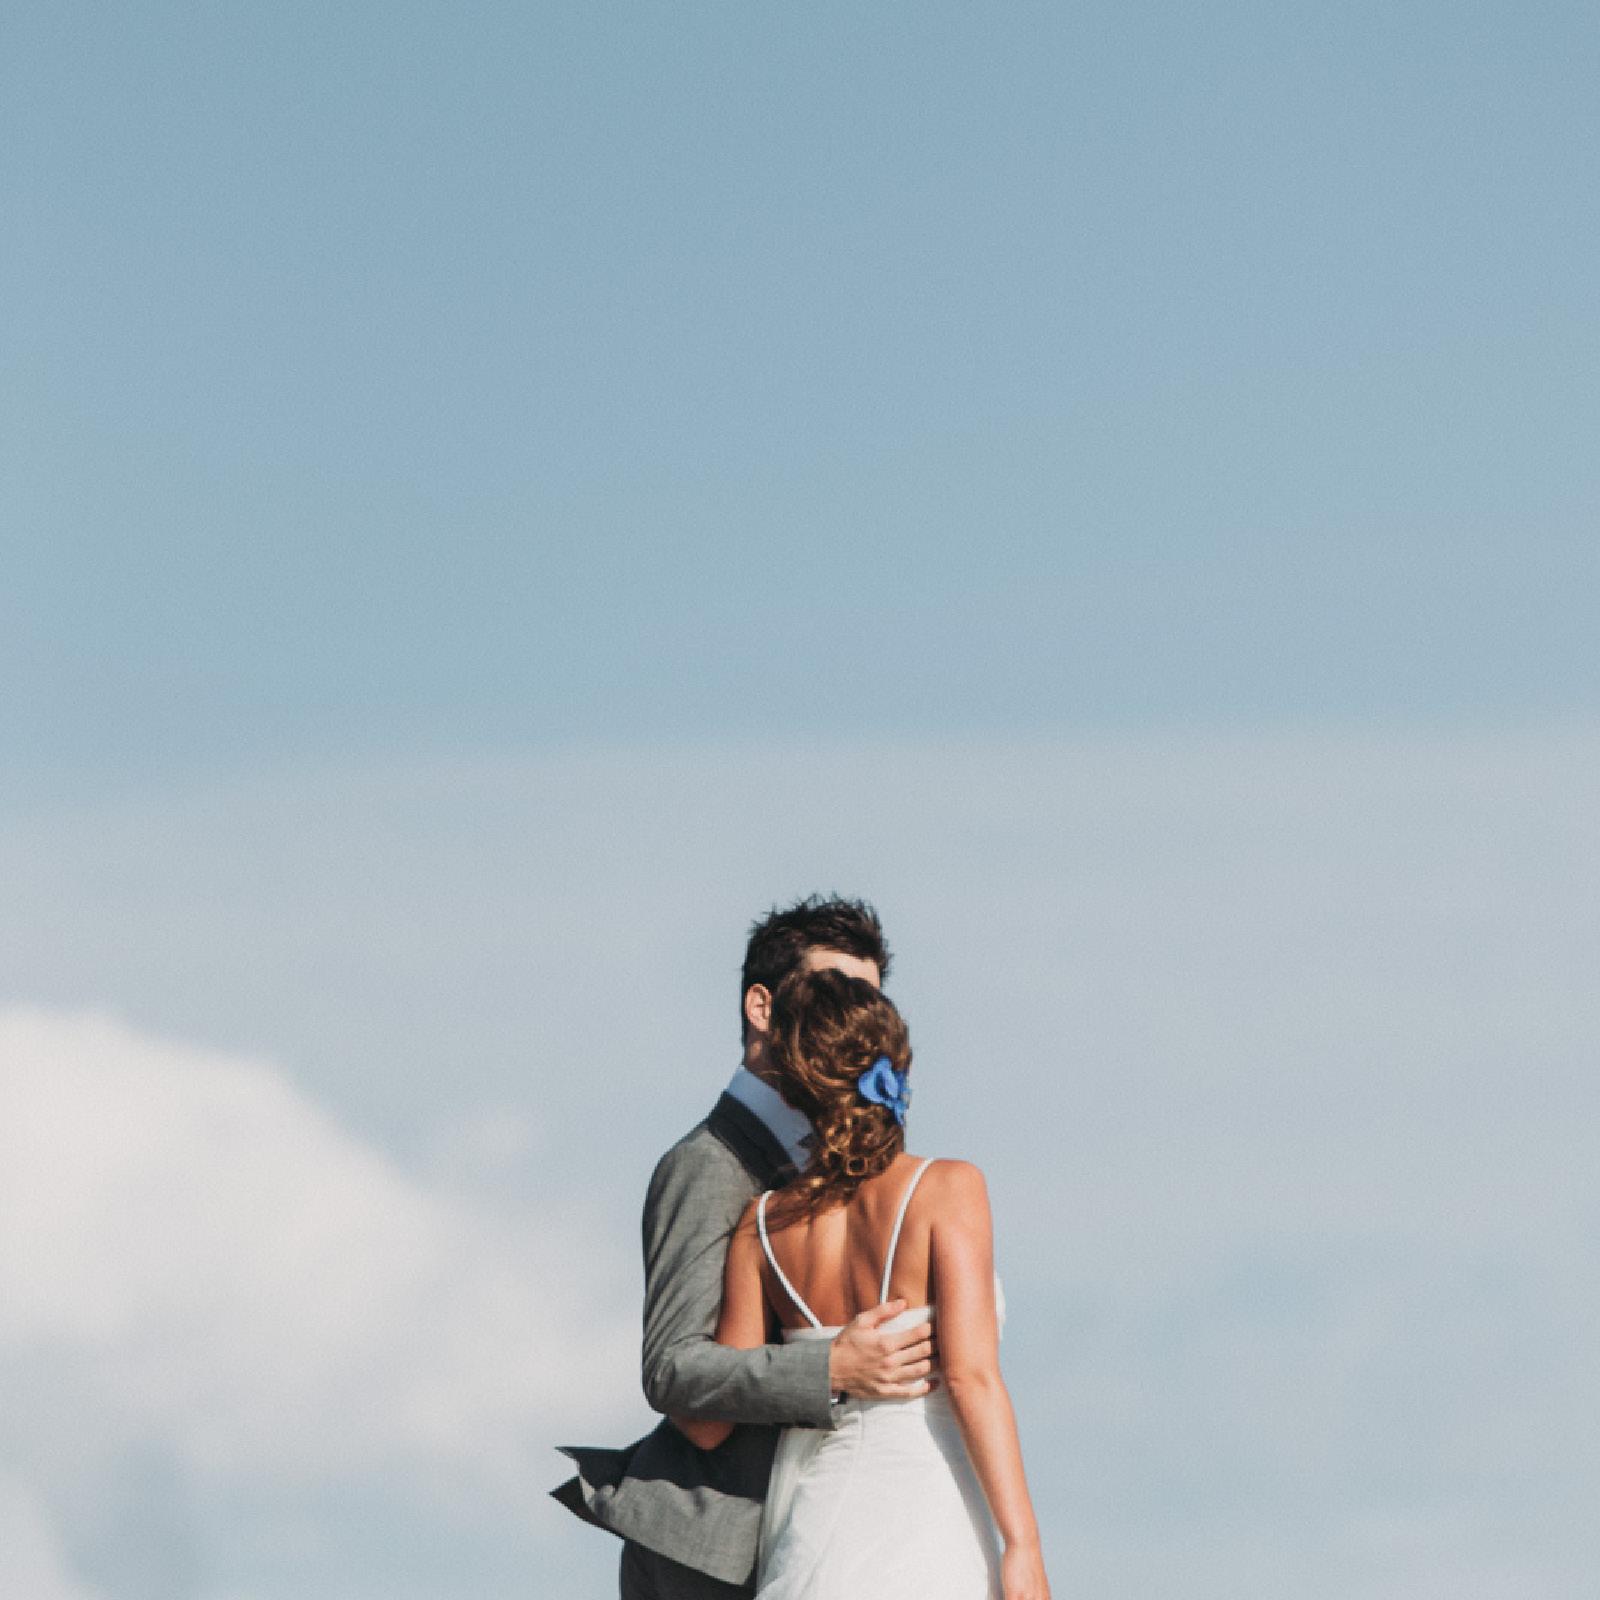 Evabloem_trouwen-sint-joris-doele_strandpaviljoen-zuid-60.jpg